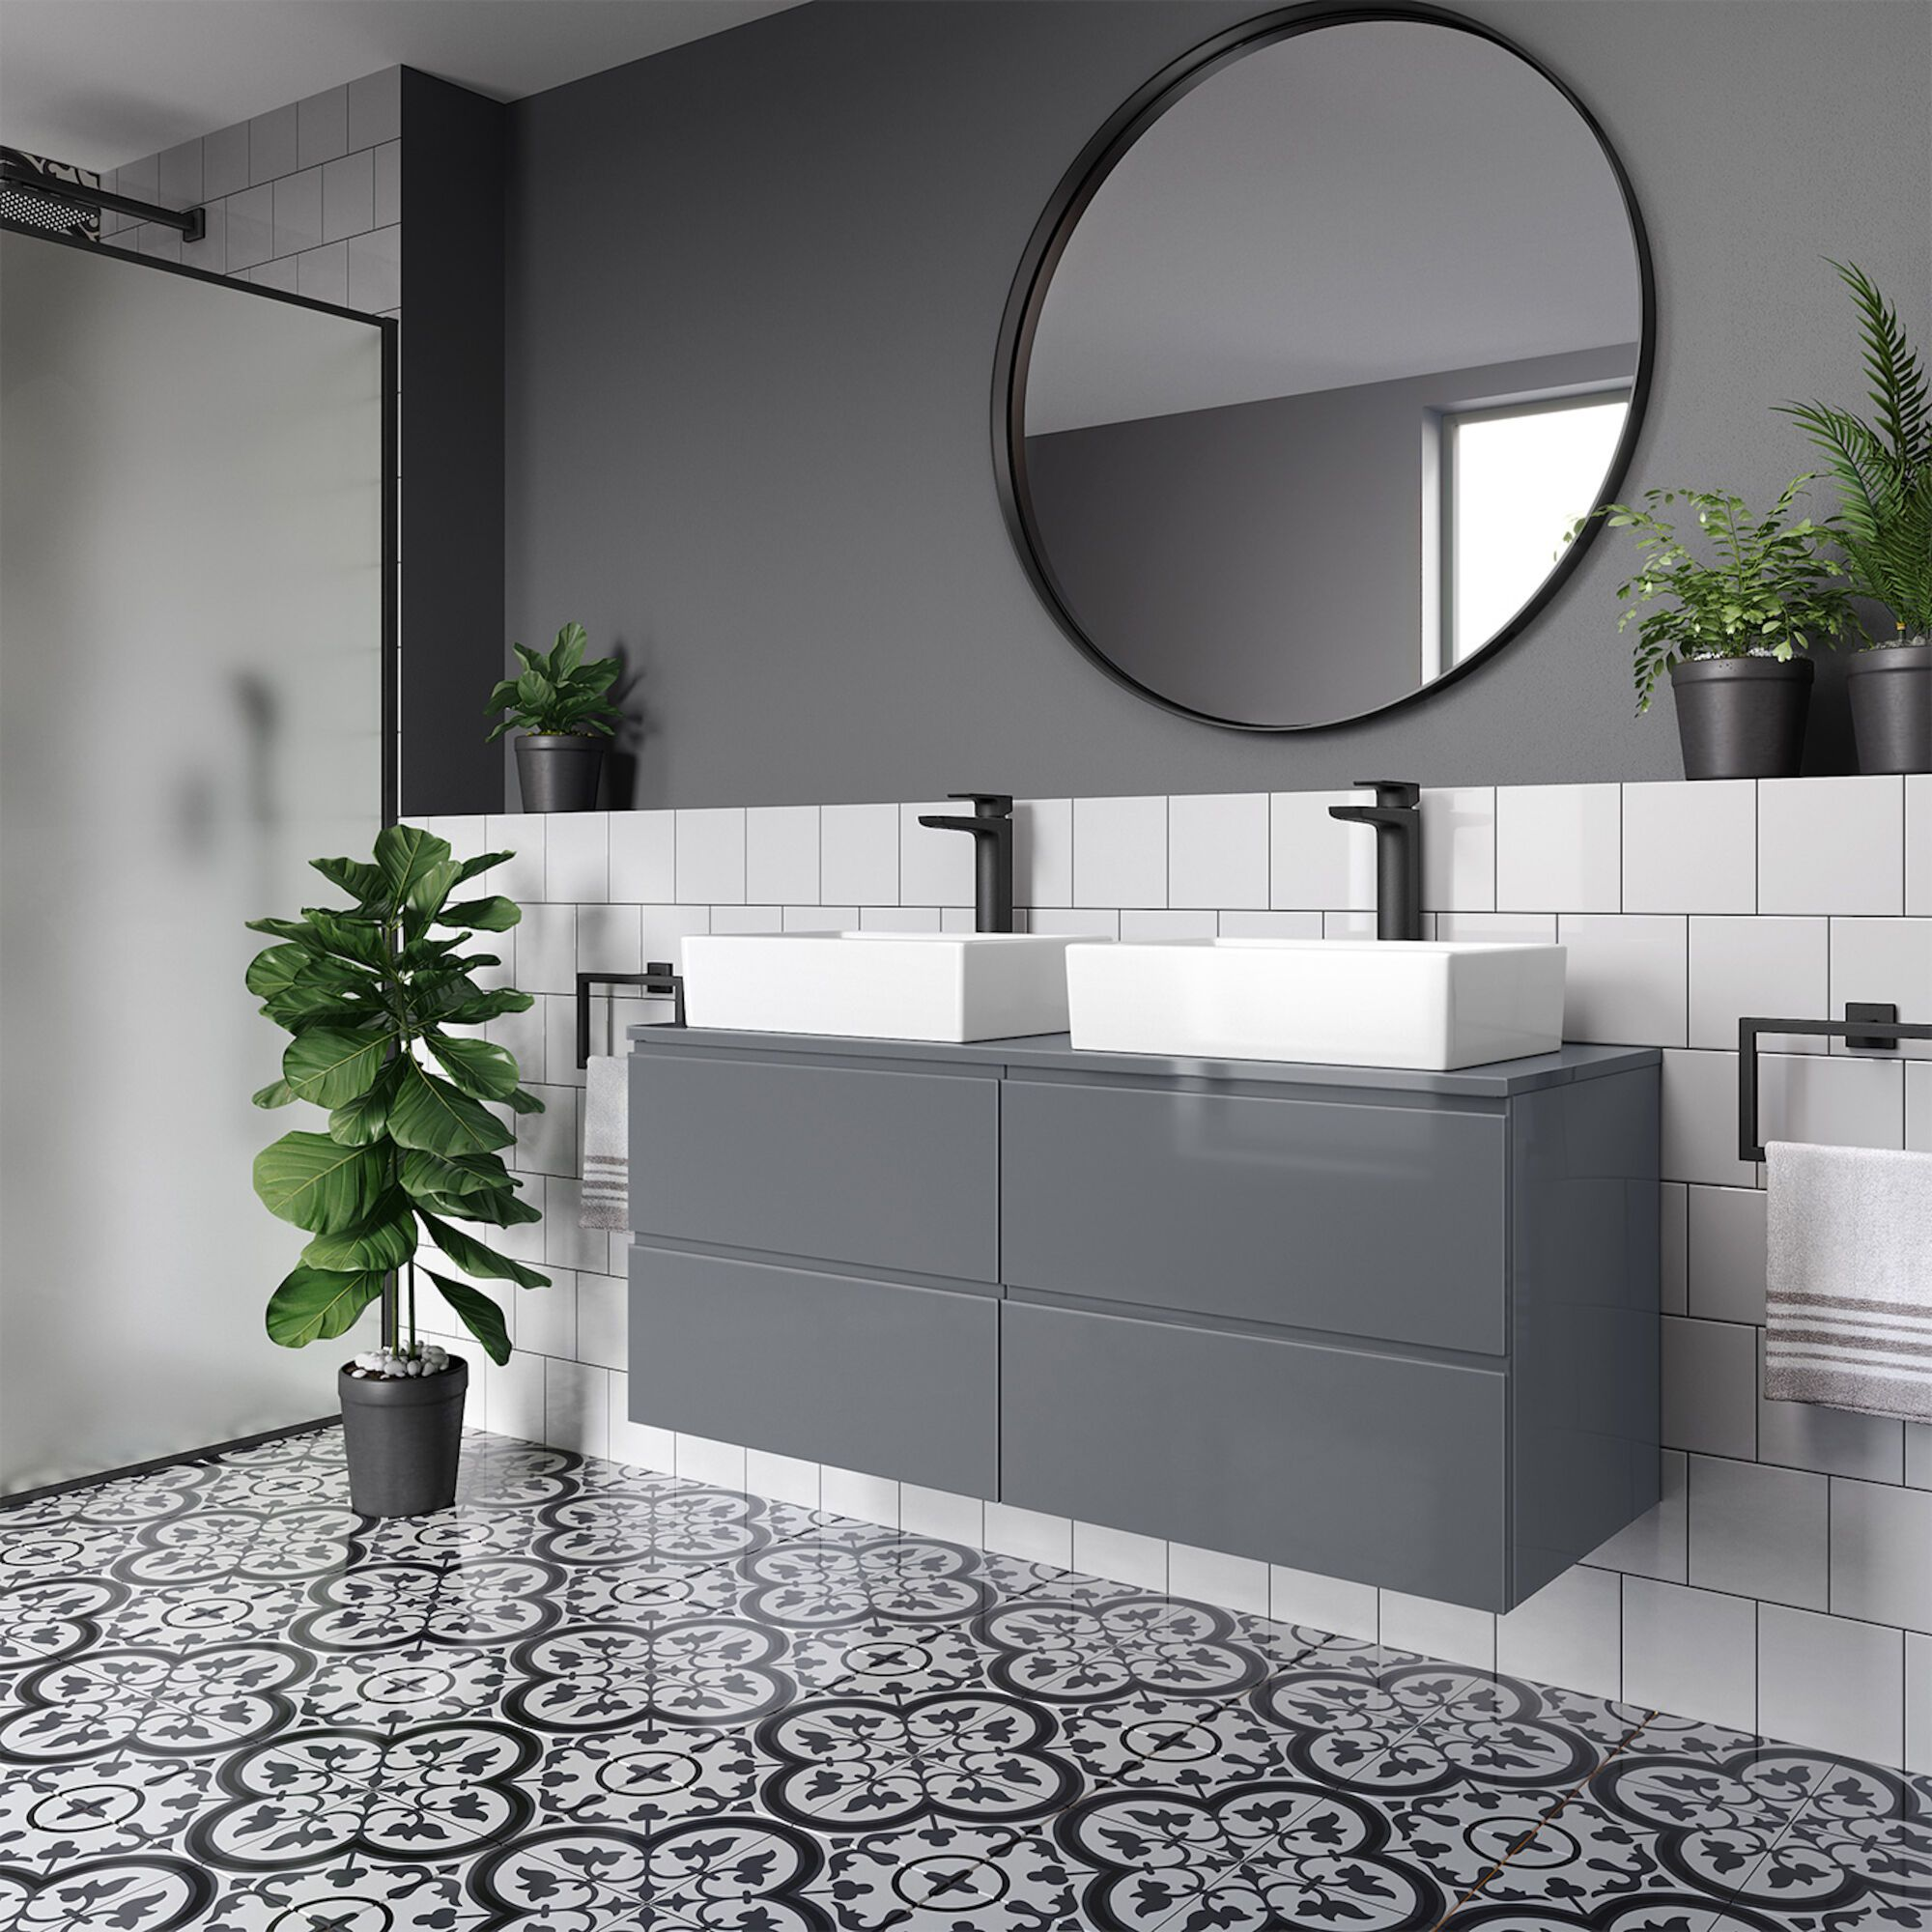 Trevia Gloss Grey Double Alicia Basin Countertop Vanity Unit 1200mm Soak Com Double Basin Vanity Unit Basin Vanity Unit Vanity Units